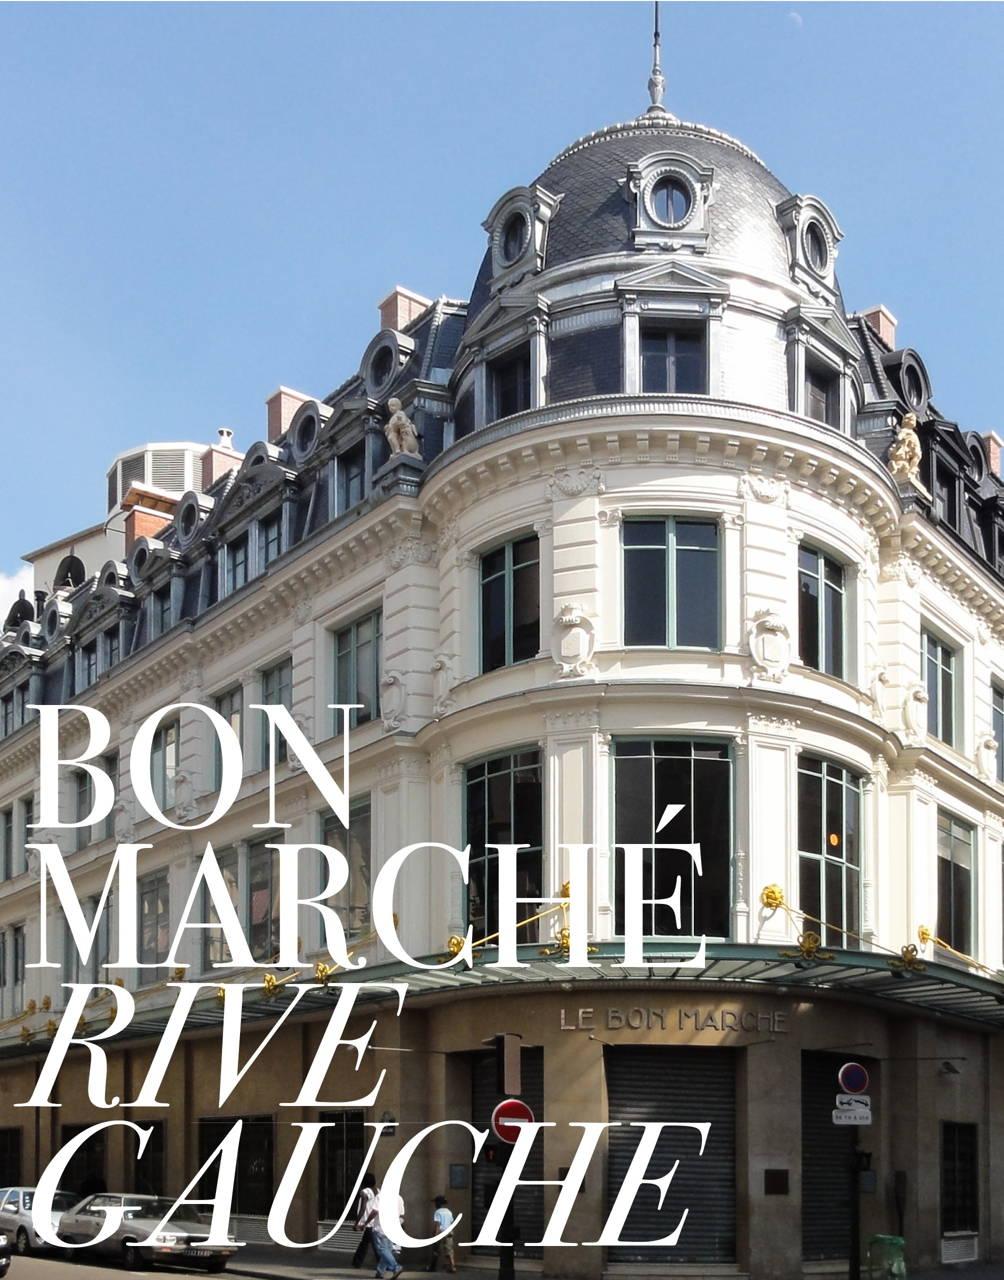 Waekura Le Bon Marché